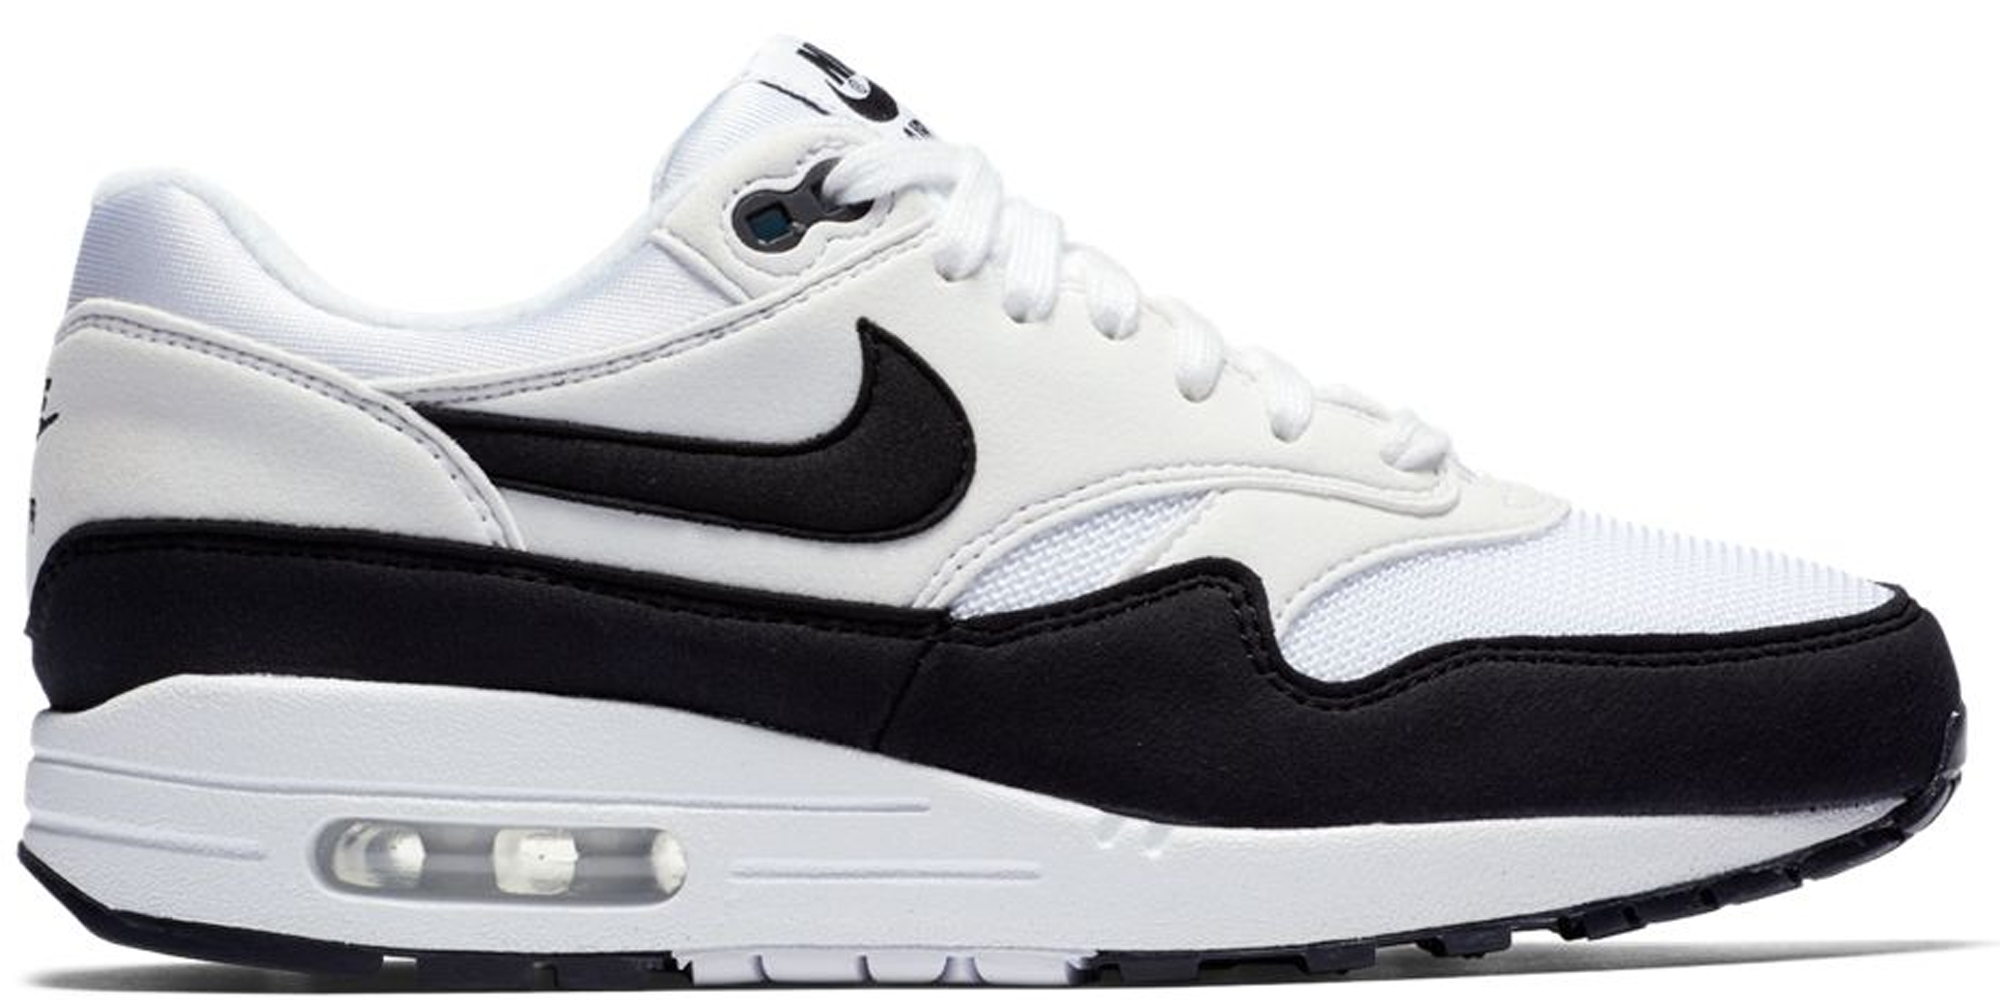 Nike Air Max 1 White Black (W) - 319986-109